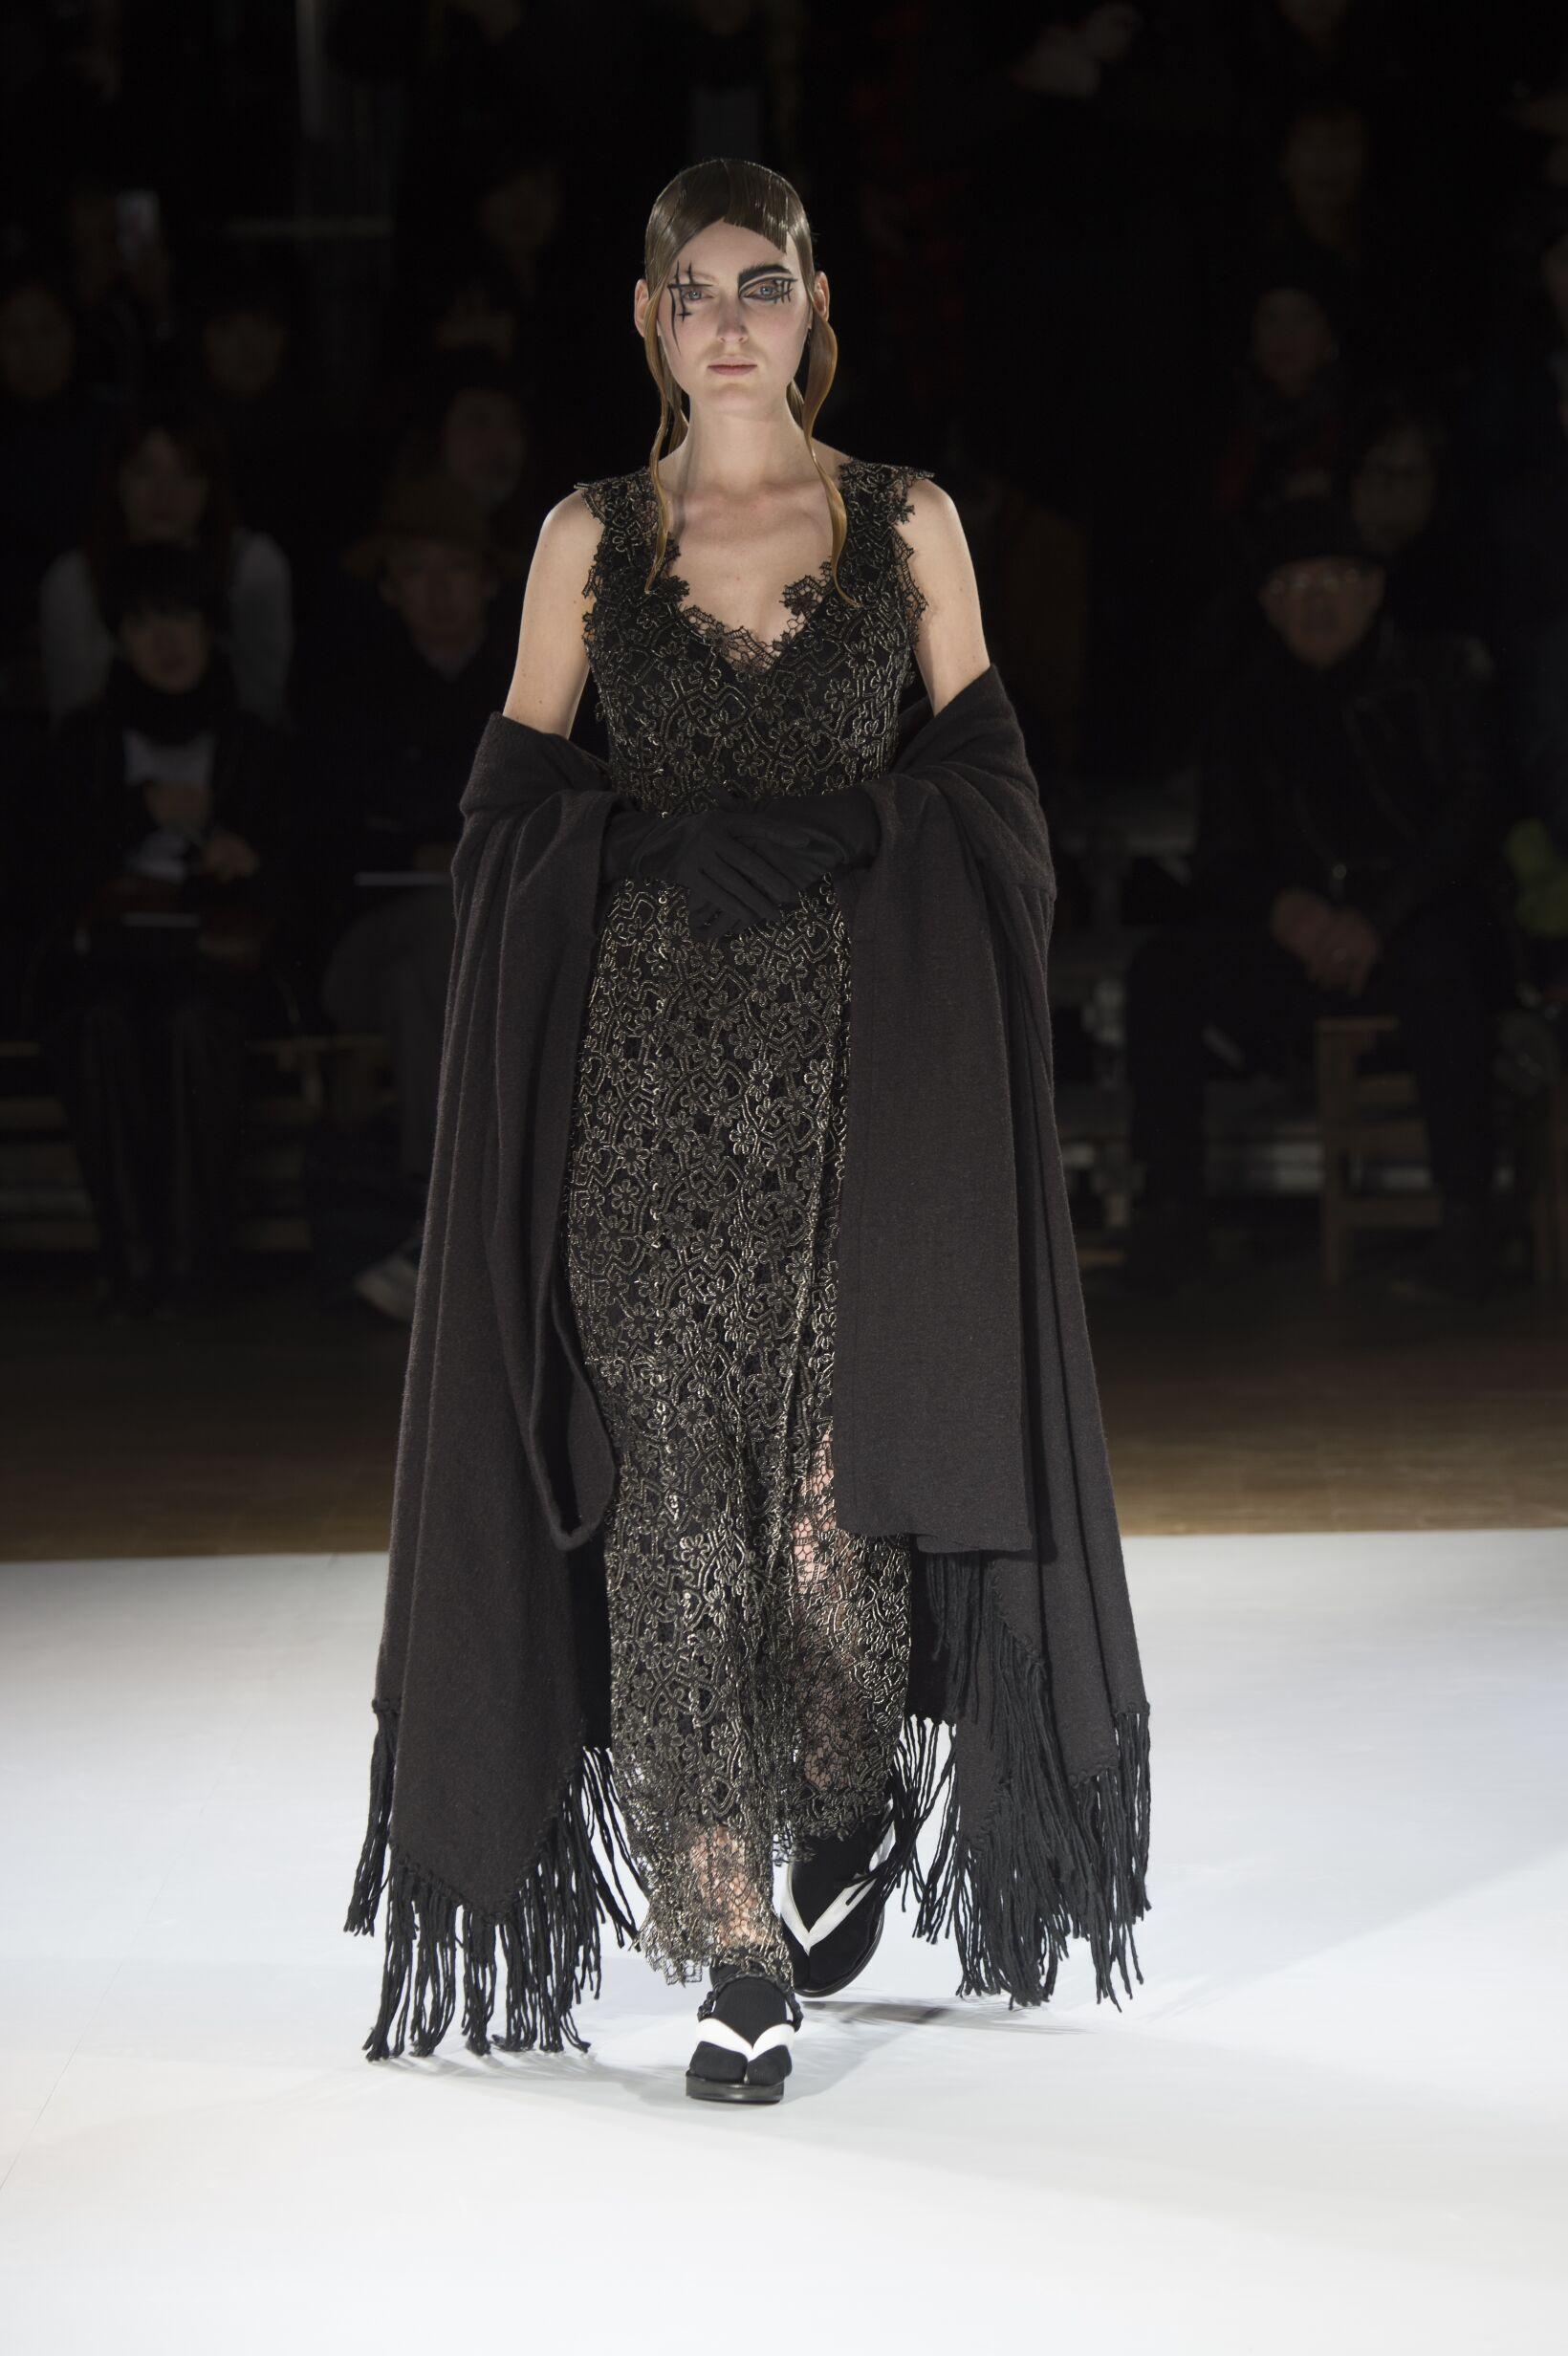 Winter Fashion Trends 2015 2016 Yohji Yamamoto Collection